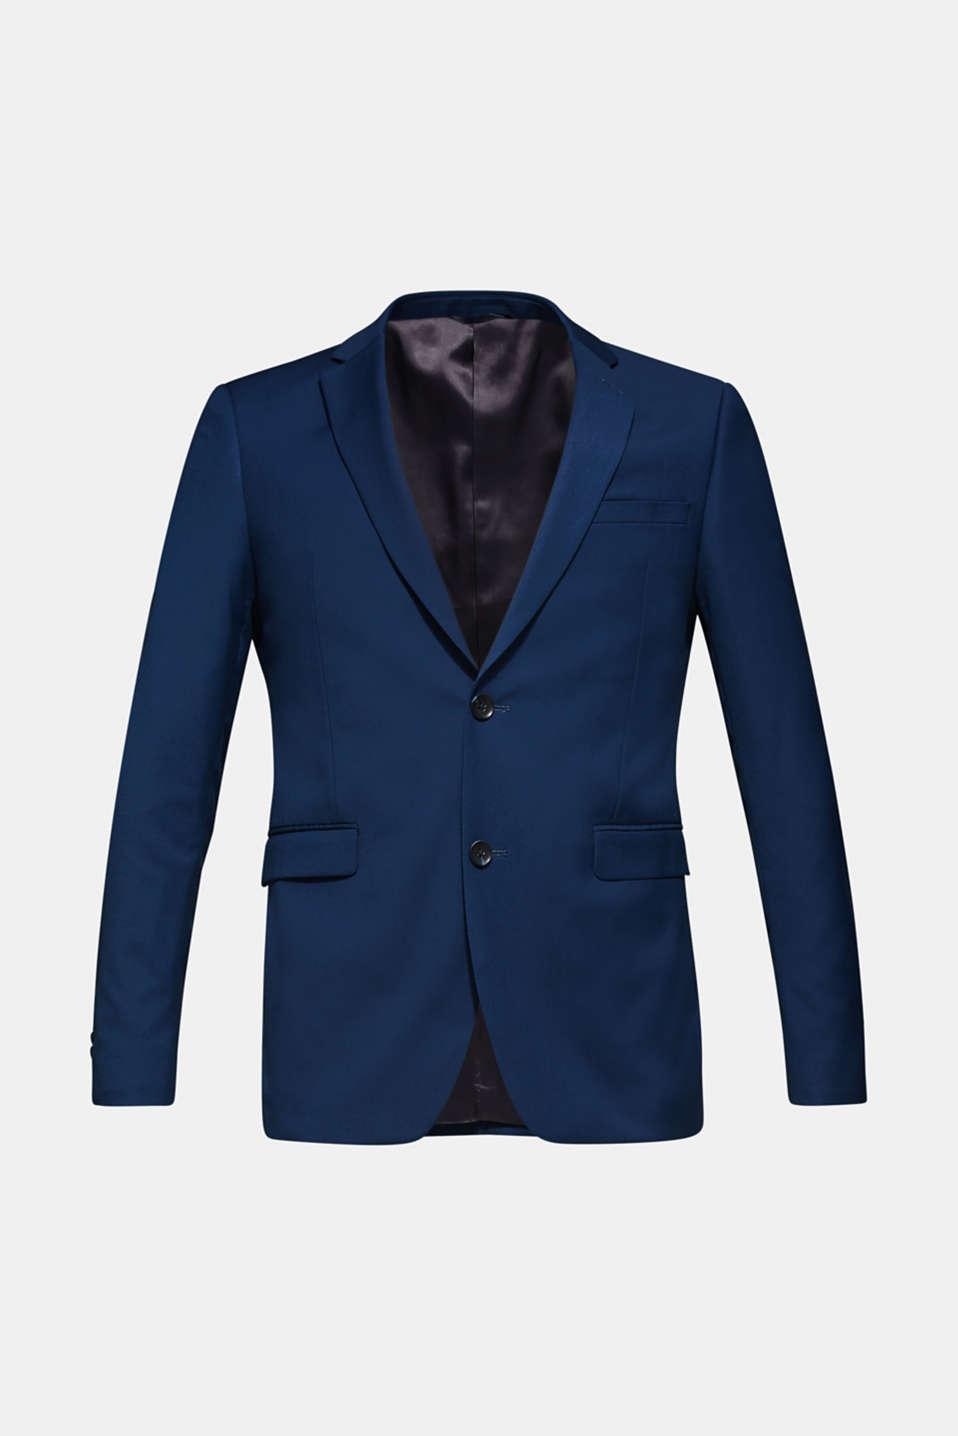 Blazers suit, BLUE, detail image number 7